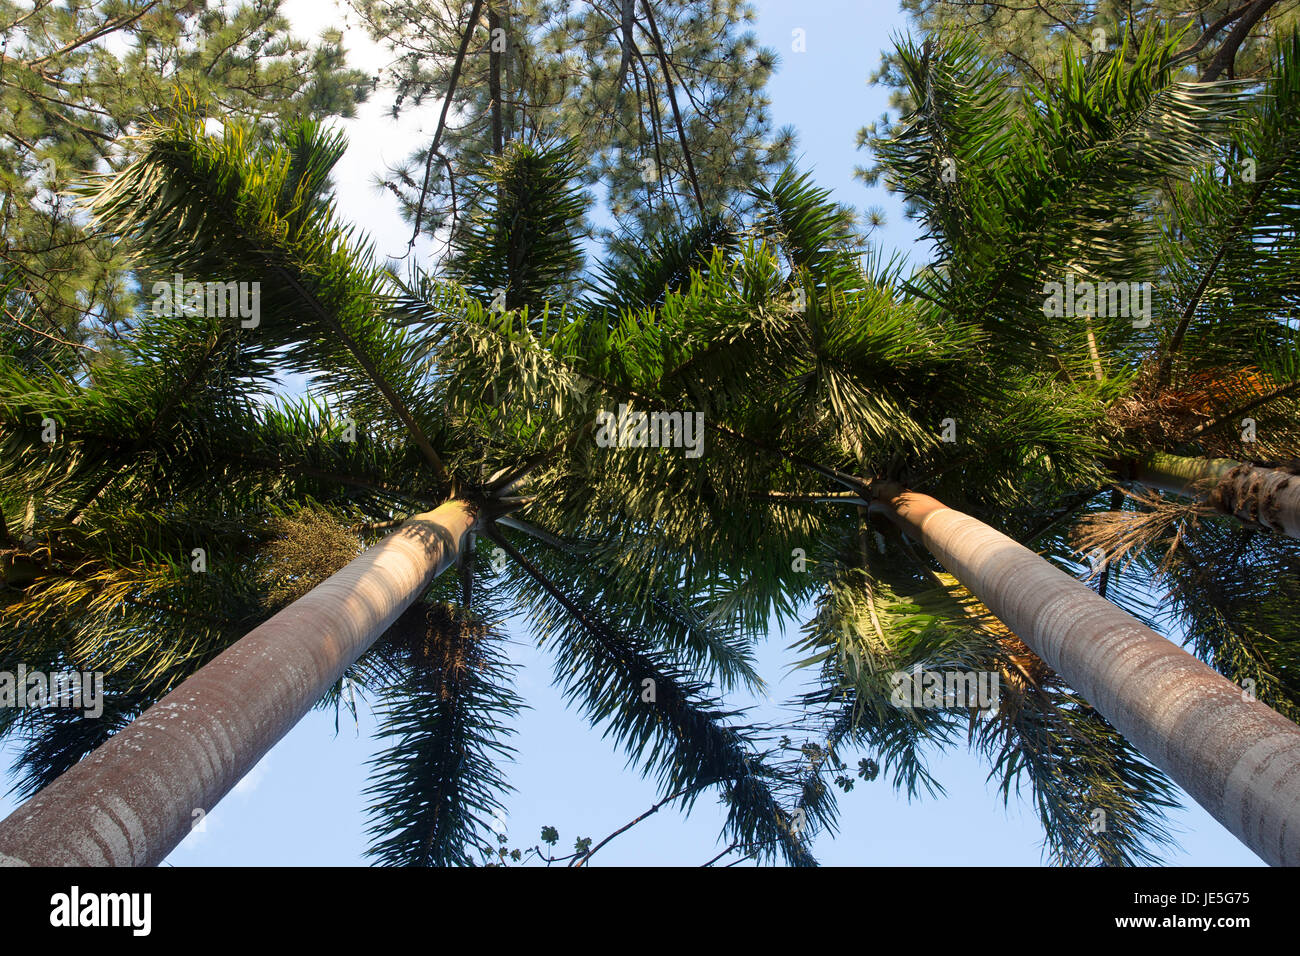 Sky View/ Palm trees - Stock Image